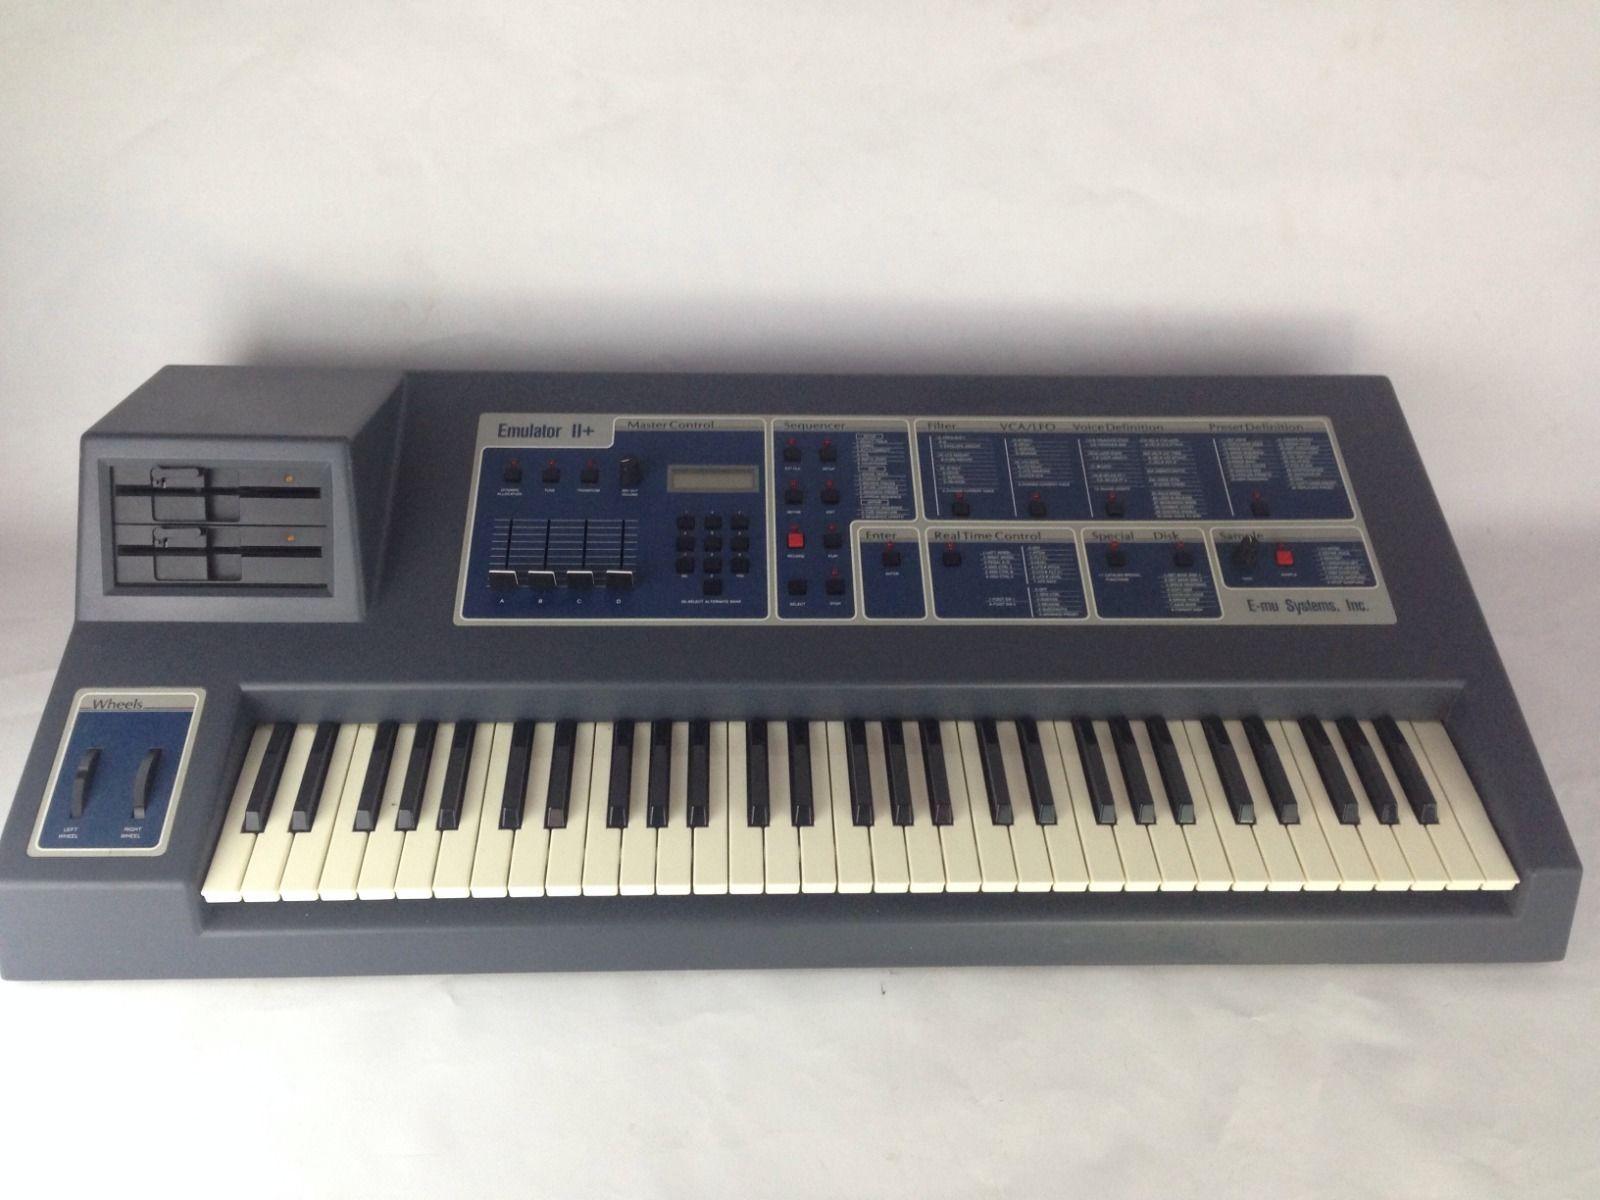 matrixsynth emu emulator ii analog synthesizer sampler drum machine sn 2695. Black Bedroom Furniture Sets. Home Design Ideas